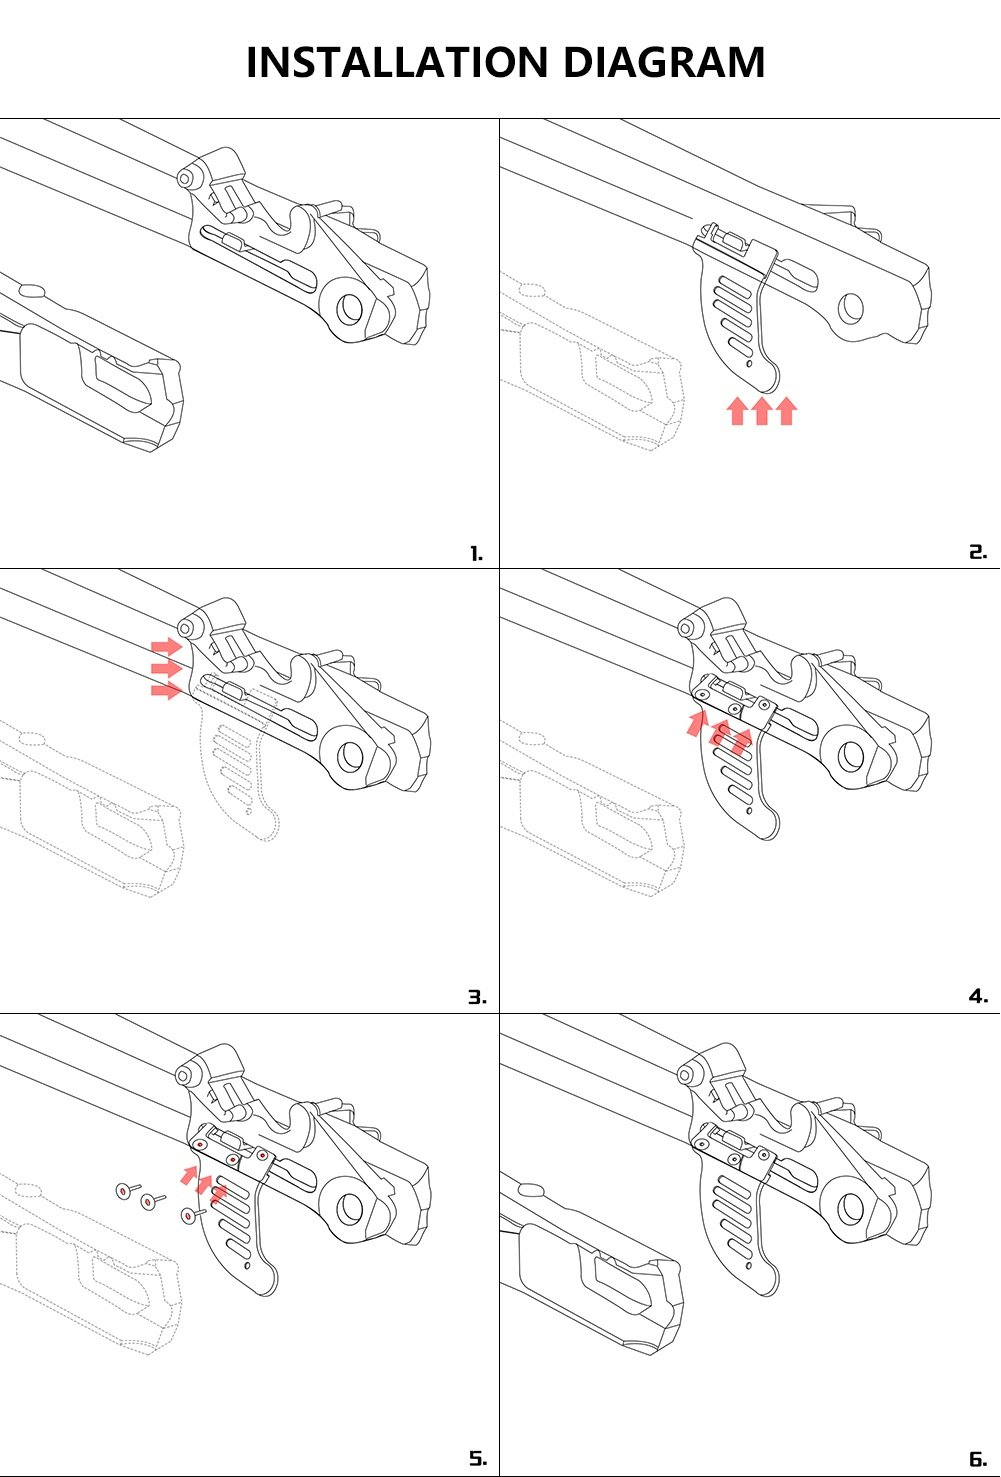 Rear Brake Disc Guard Protector For Husaberg Te 125 250 Wiring Diagram 2006 Ktm 200 Exc 300 2011 2014 Fe Fs Fx 350 390 450 501 570 2009 Husqvarna Tc Fc 2015 Sx Xc W 2003 2015black Automotive